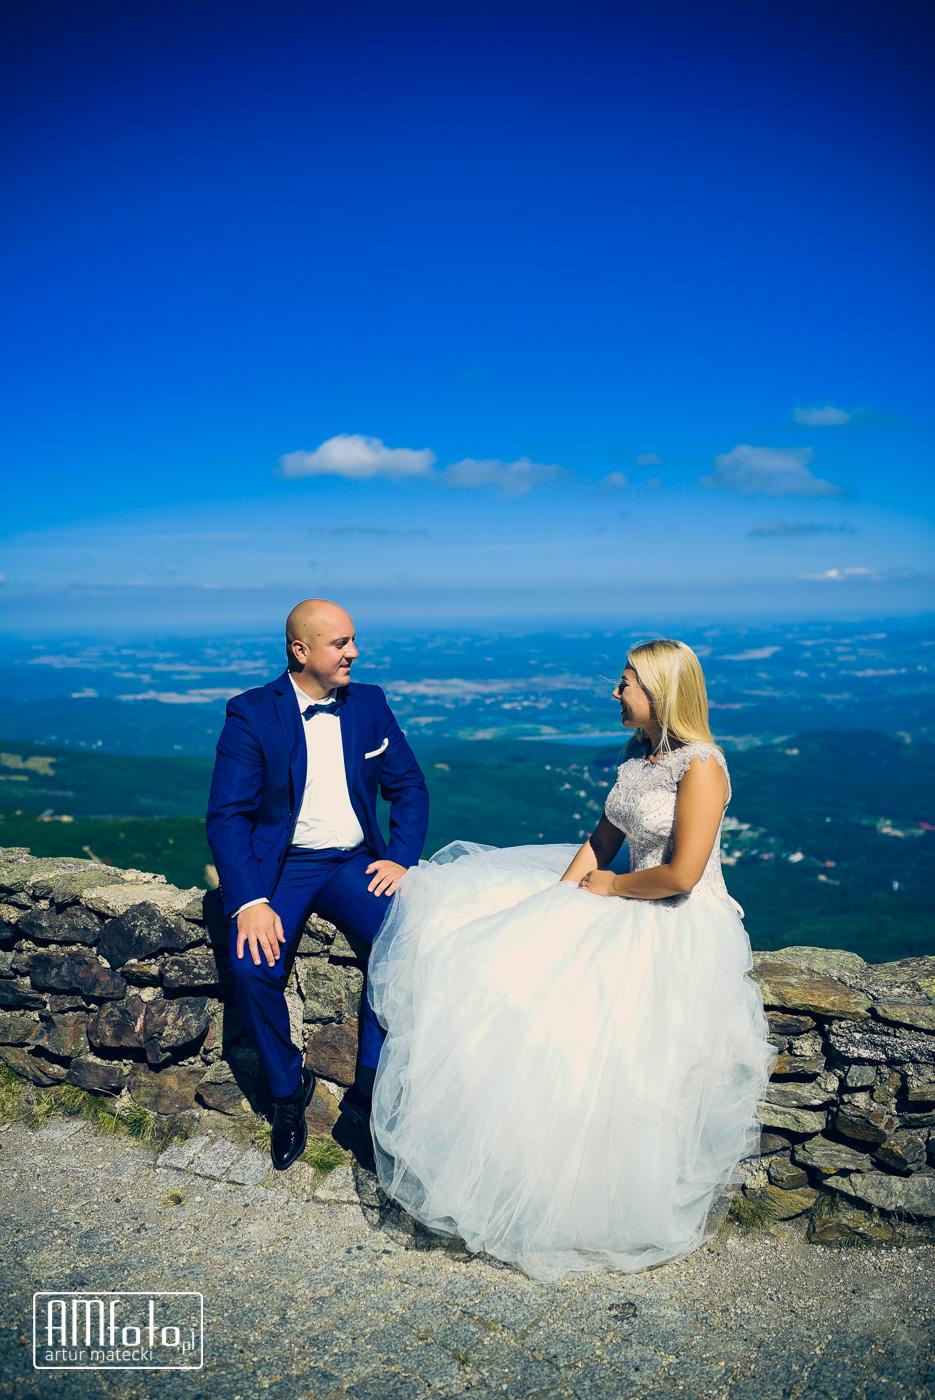 0221_Maja&Sebastian_sesja_poslubna_plener_sniezka_karpacz_czechy_pec____www-amfoto-pl__AMF_6931.jpg